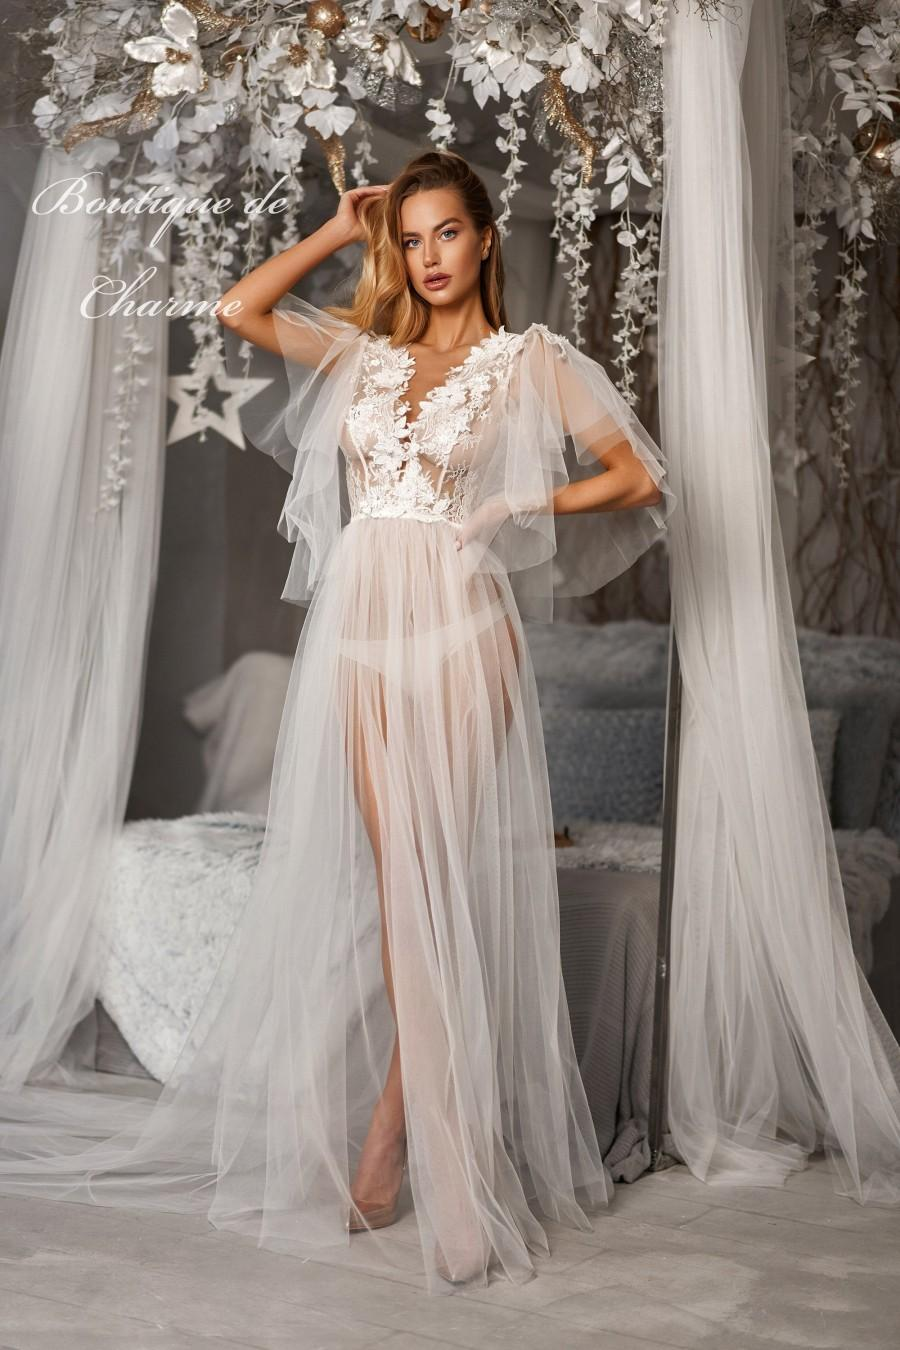 Hochzeit - Long tulle dress, Lace wedding robe, Bridal boudoir,Bride peignoir,Tulle wedding dress,Sheer boudoir robe,Wedding lingerie,White bridal robe